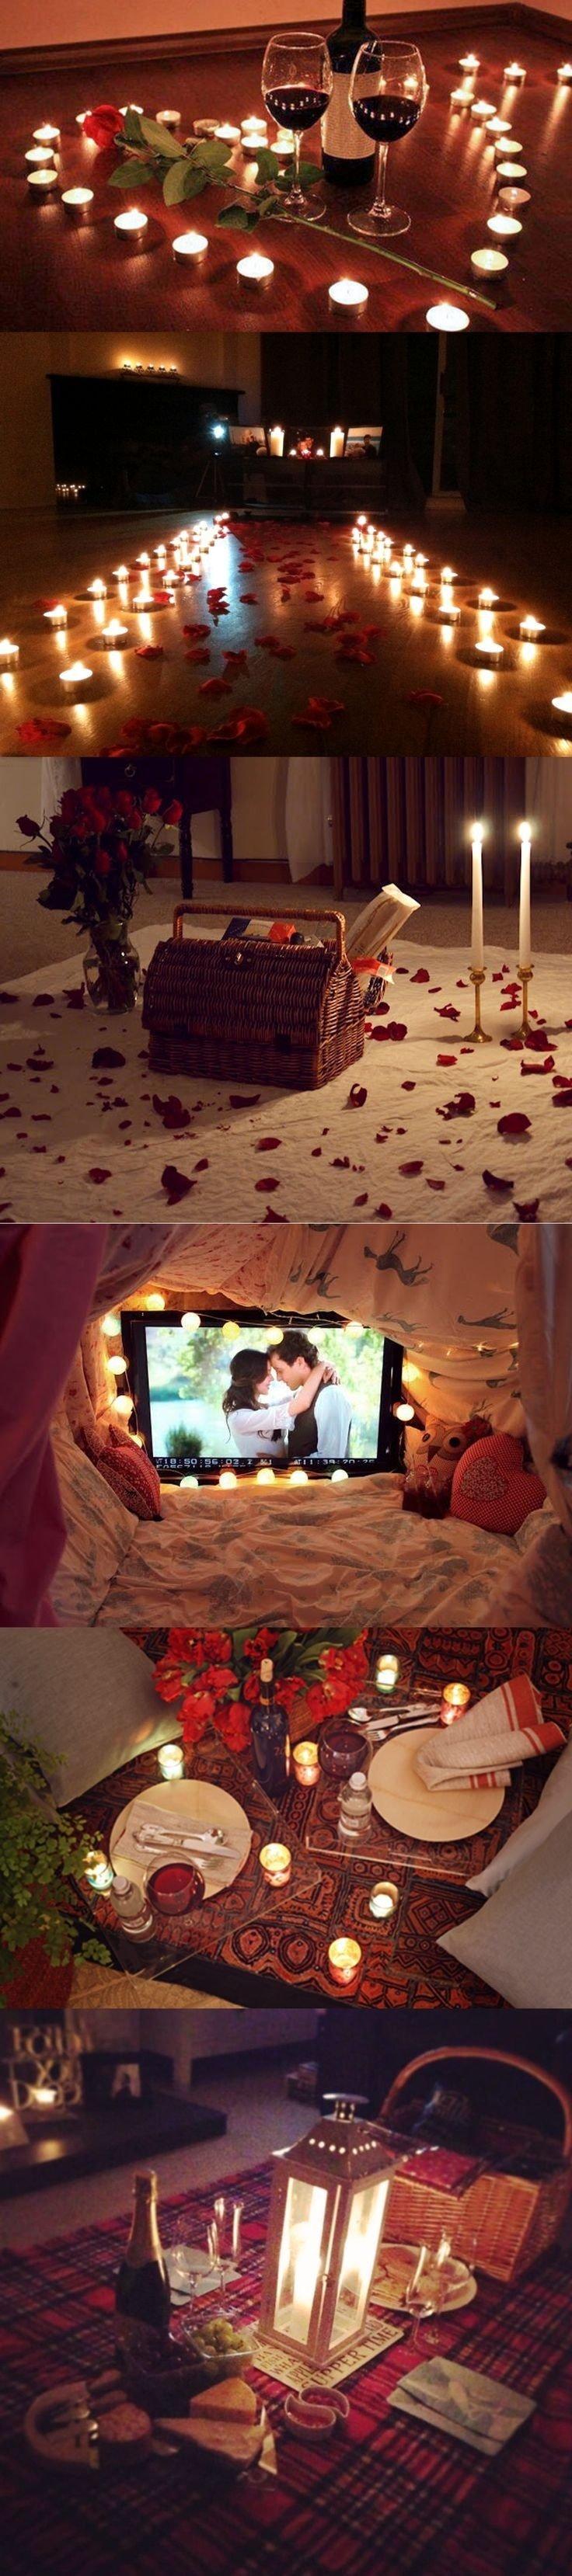 10 Stylish Ideas For A Romantic Night 152 best date ideas images on pinterest my love romantic ideas 1